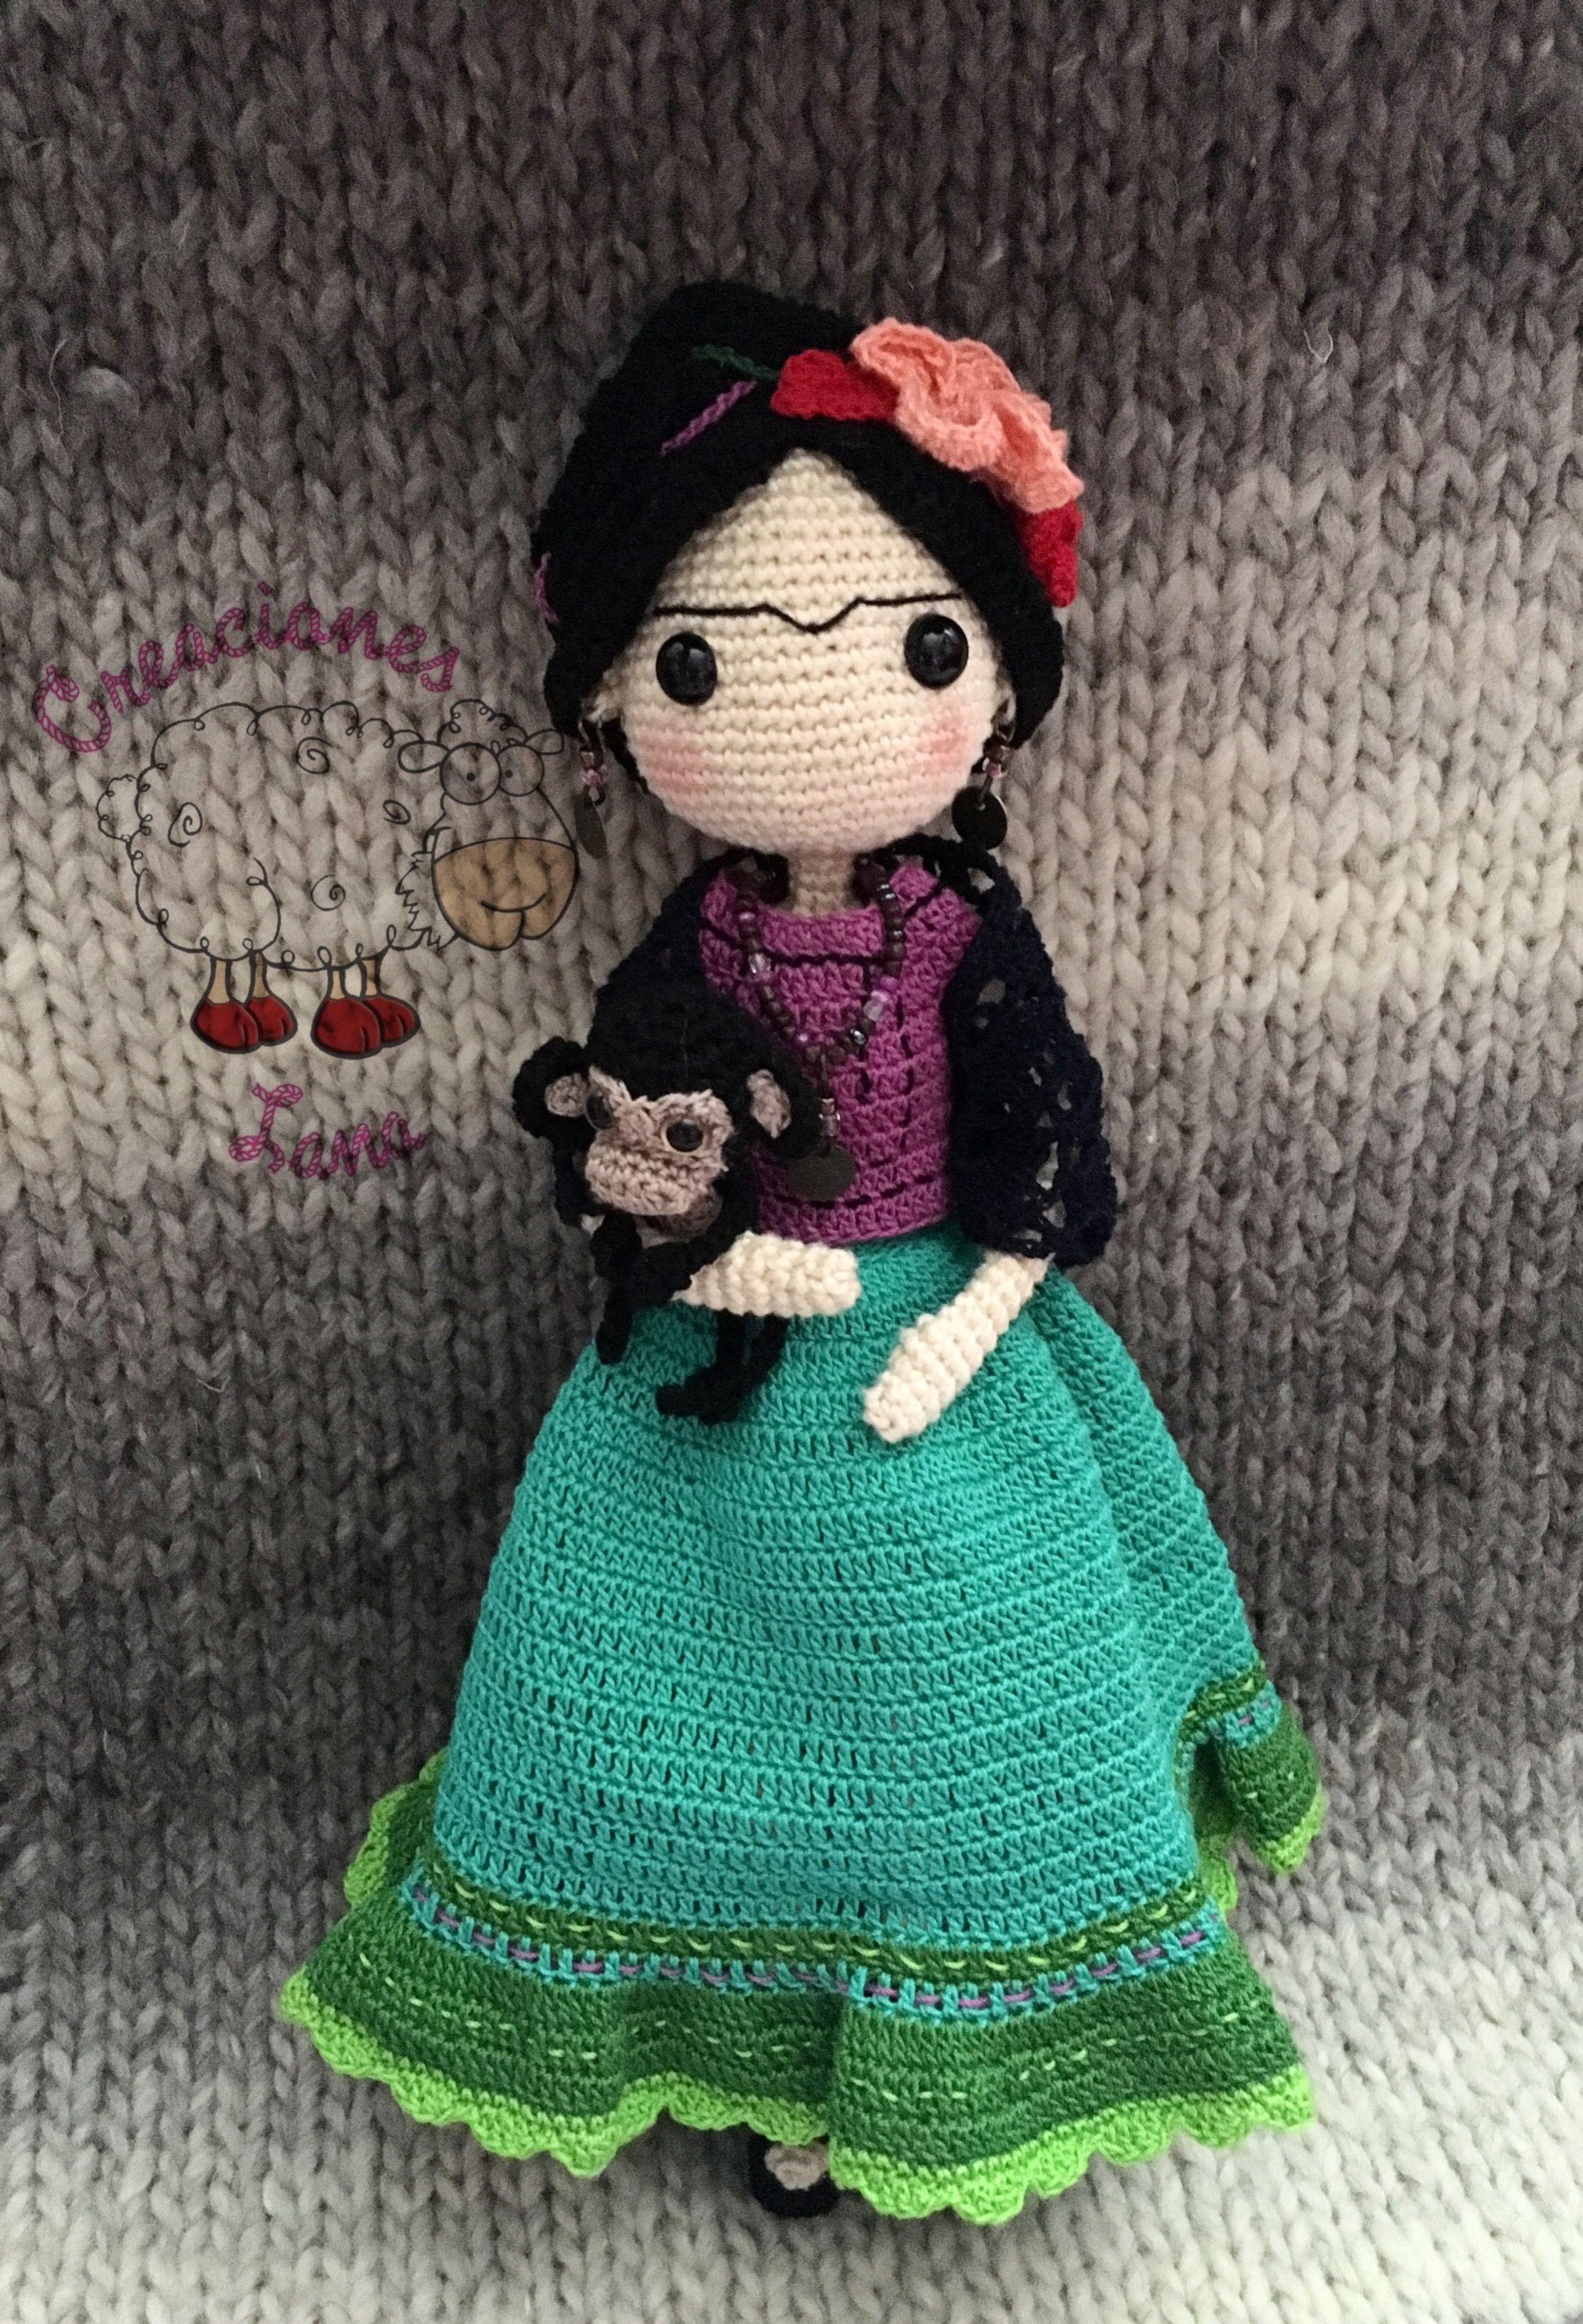 Frida Kahlo crochet | Tejidos | Pinterest | Frida, Frida kahlo y Muñecas